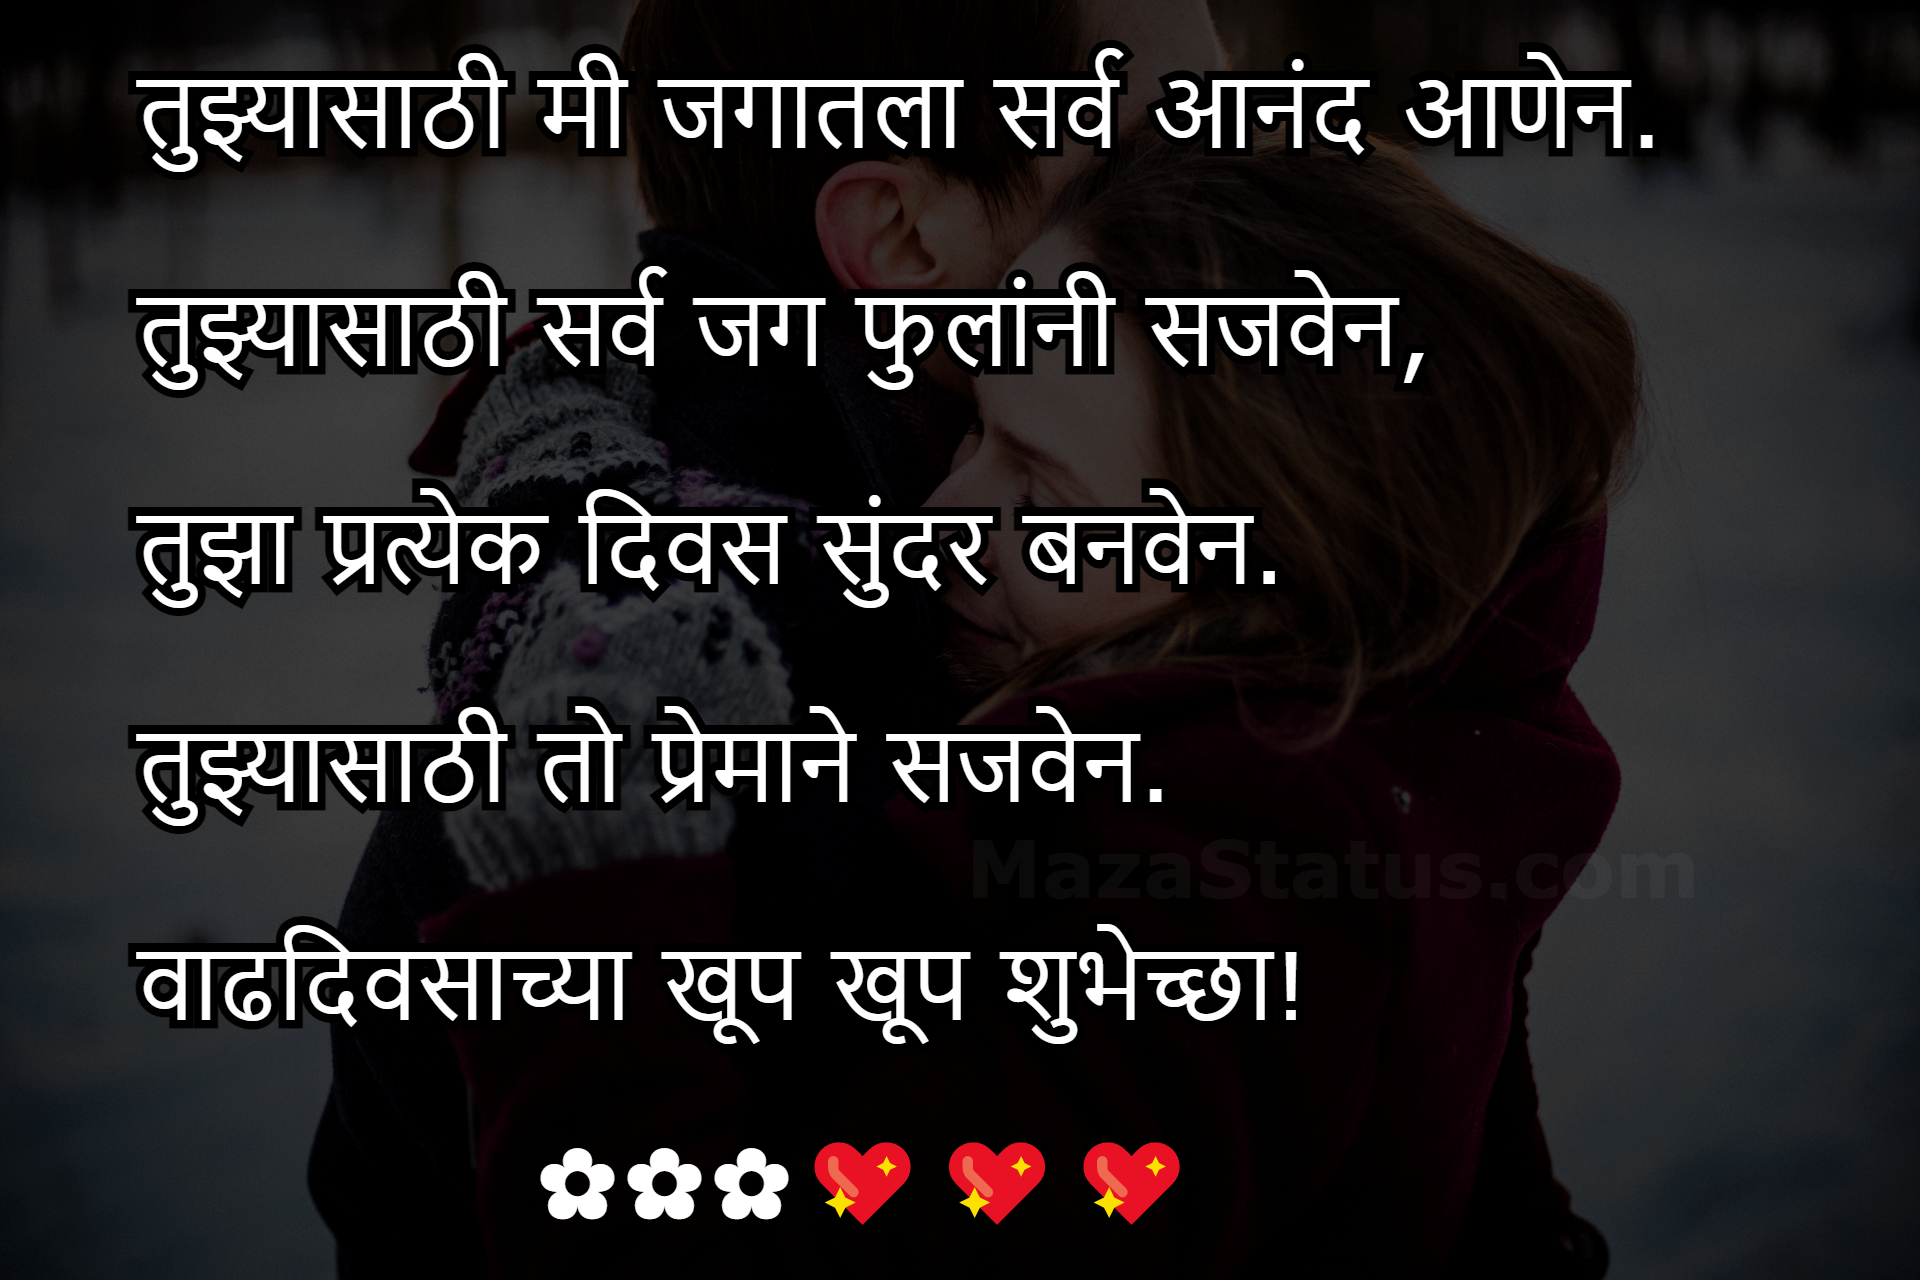 Happy Birthday Wishes for Boyfriend in Marathi